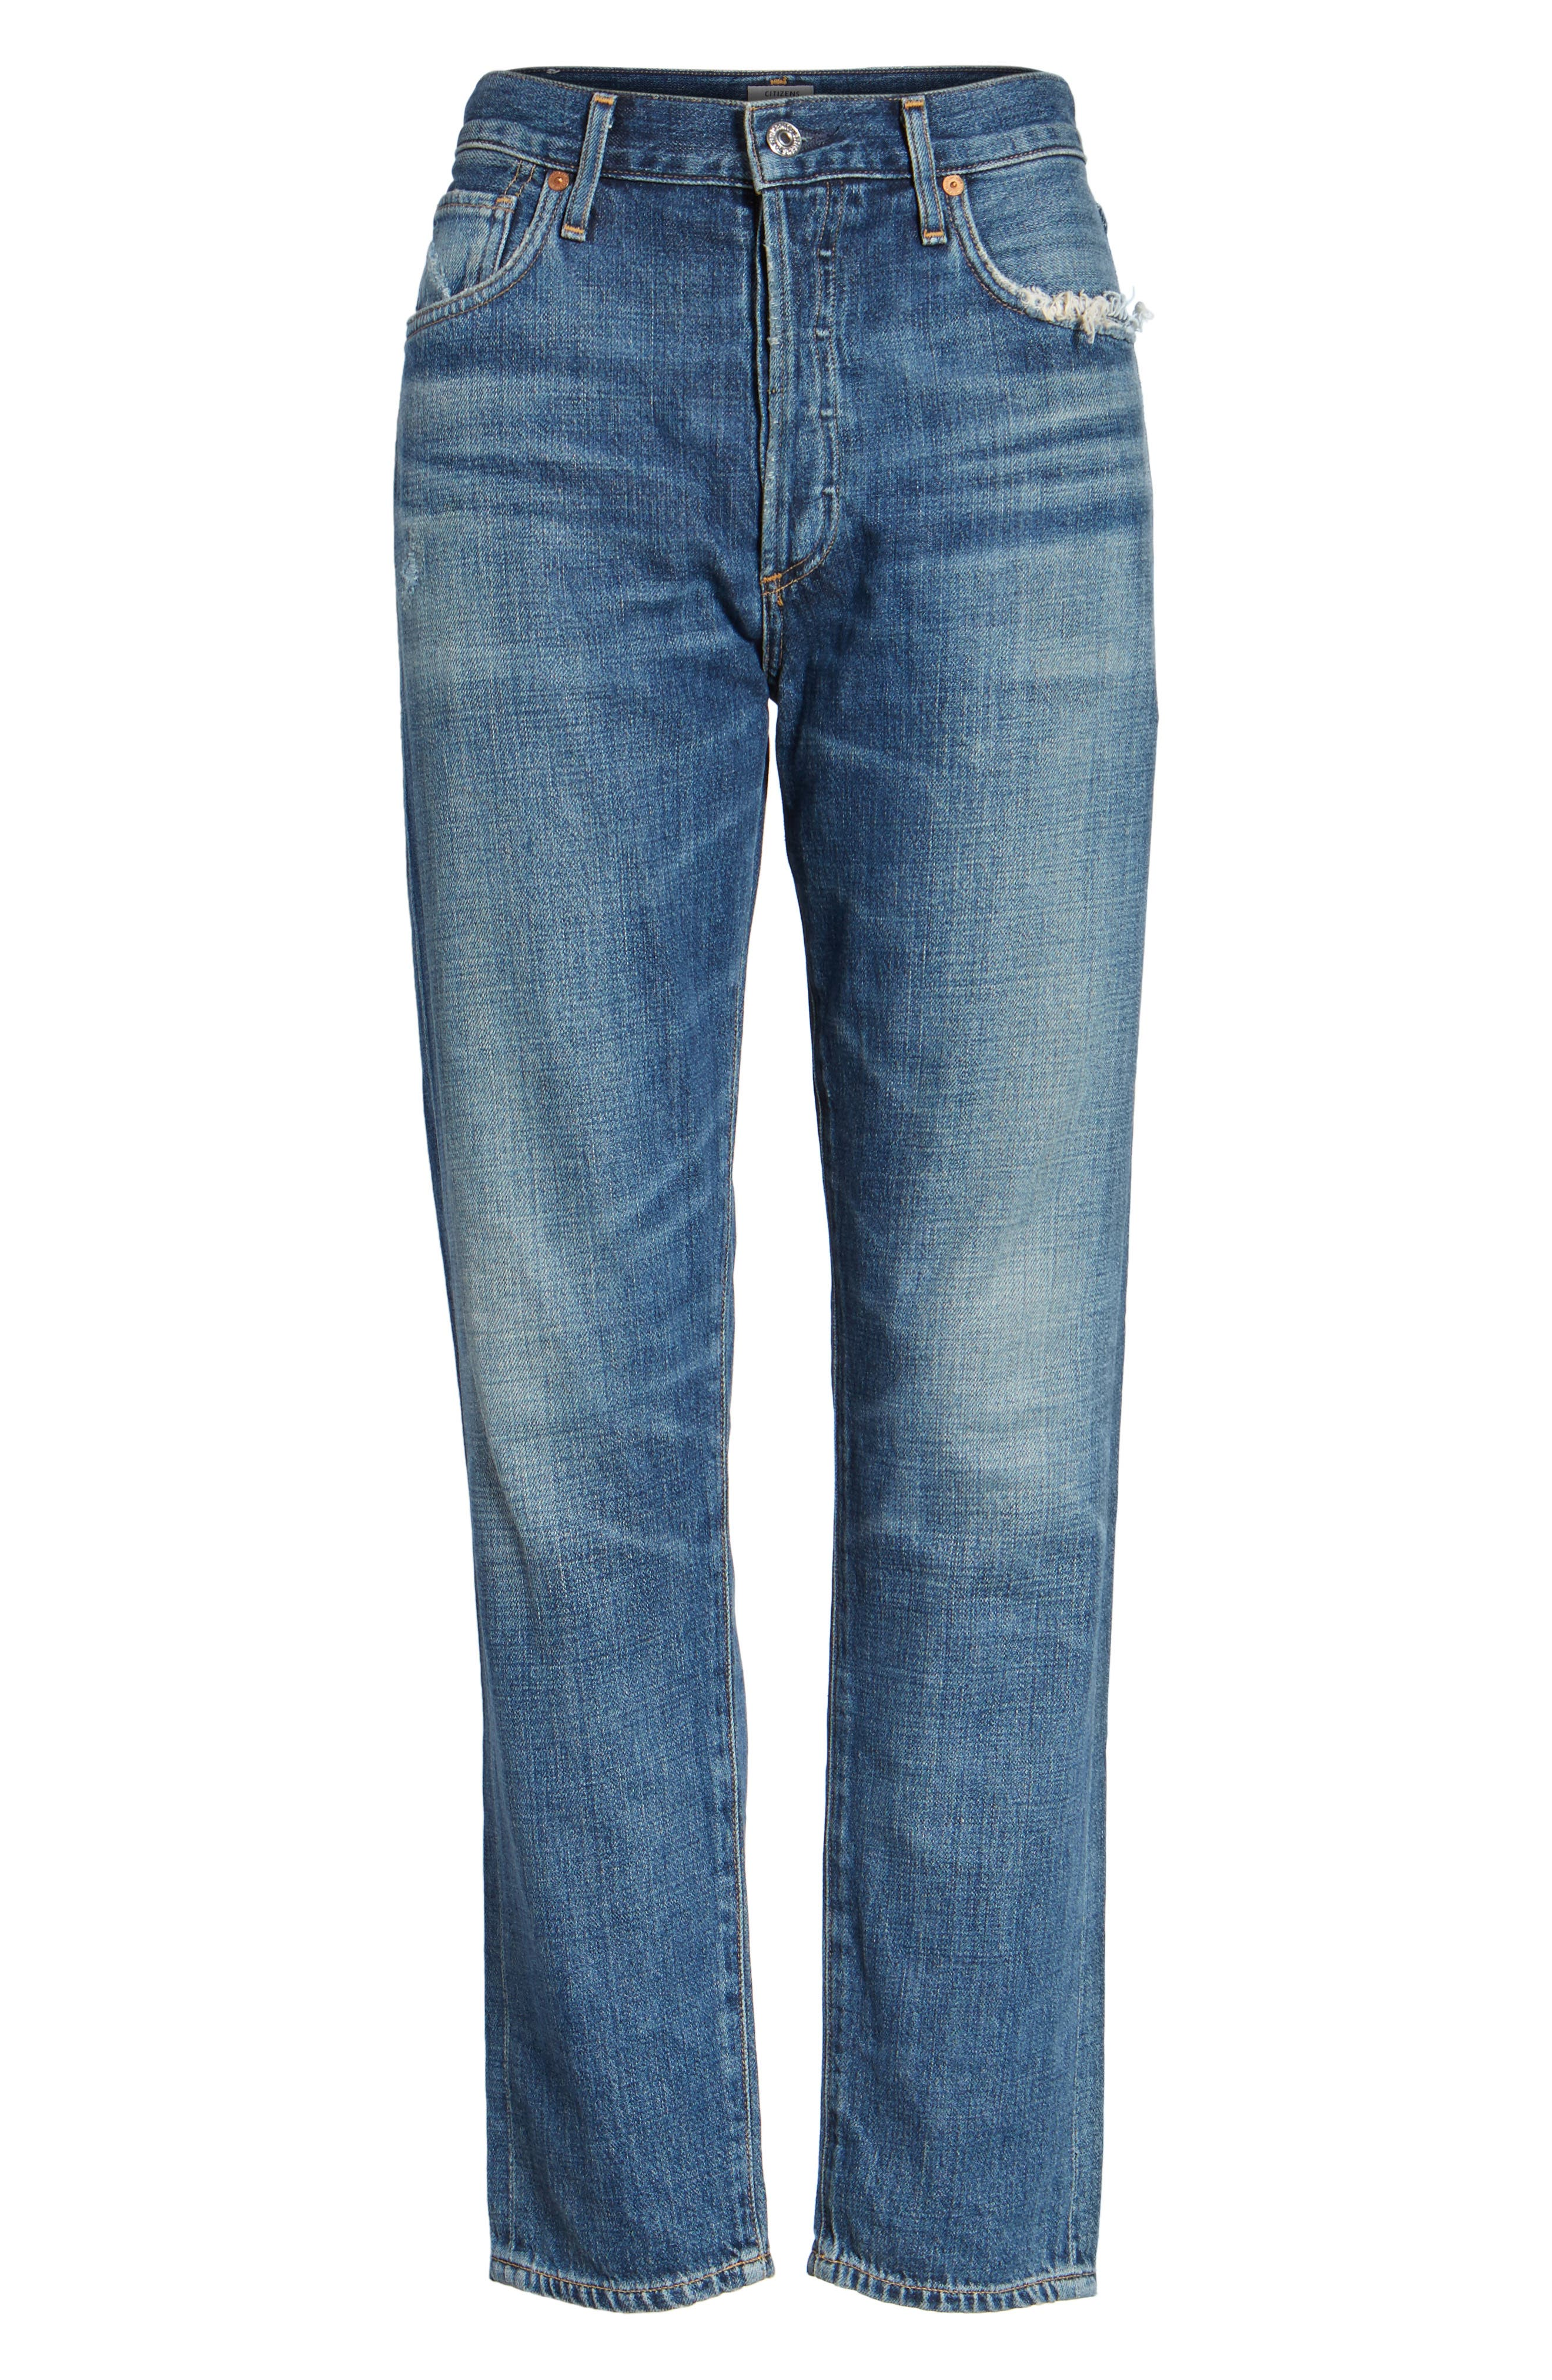 Liya High Waist Slim Boyfriend Jeans,                             Main thumbnail 1, color,                             426